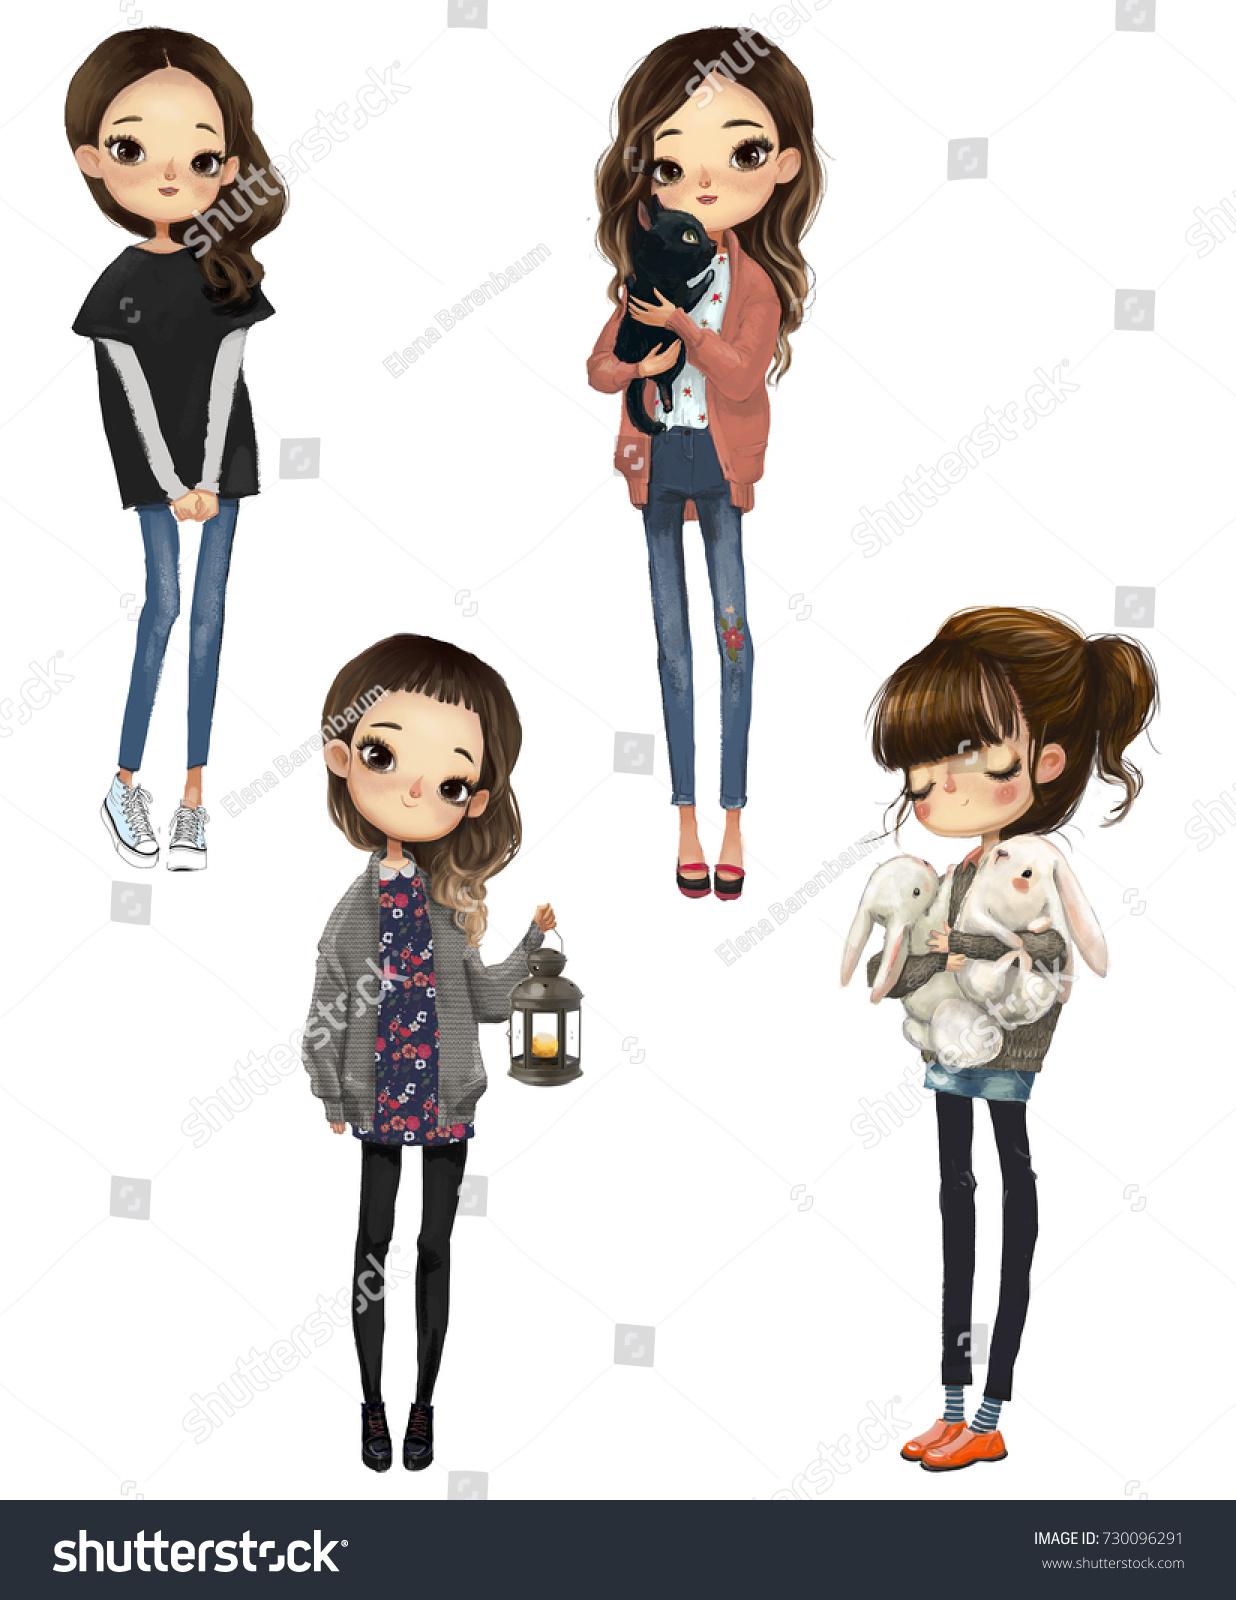 set four cartoon cute girls stock illustration 730096291 - shutterstock